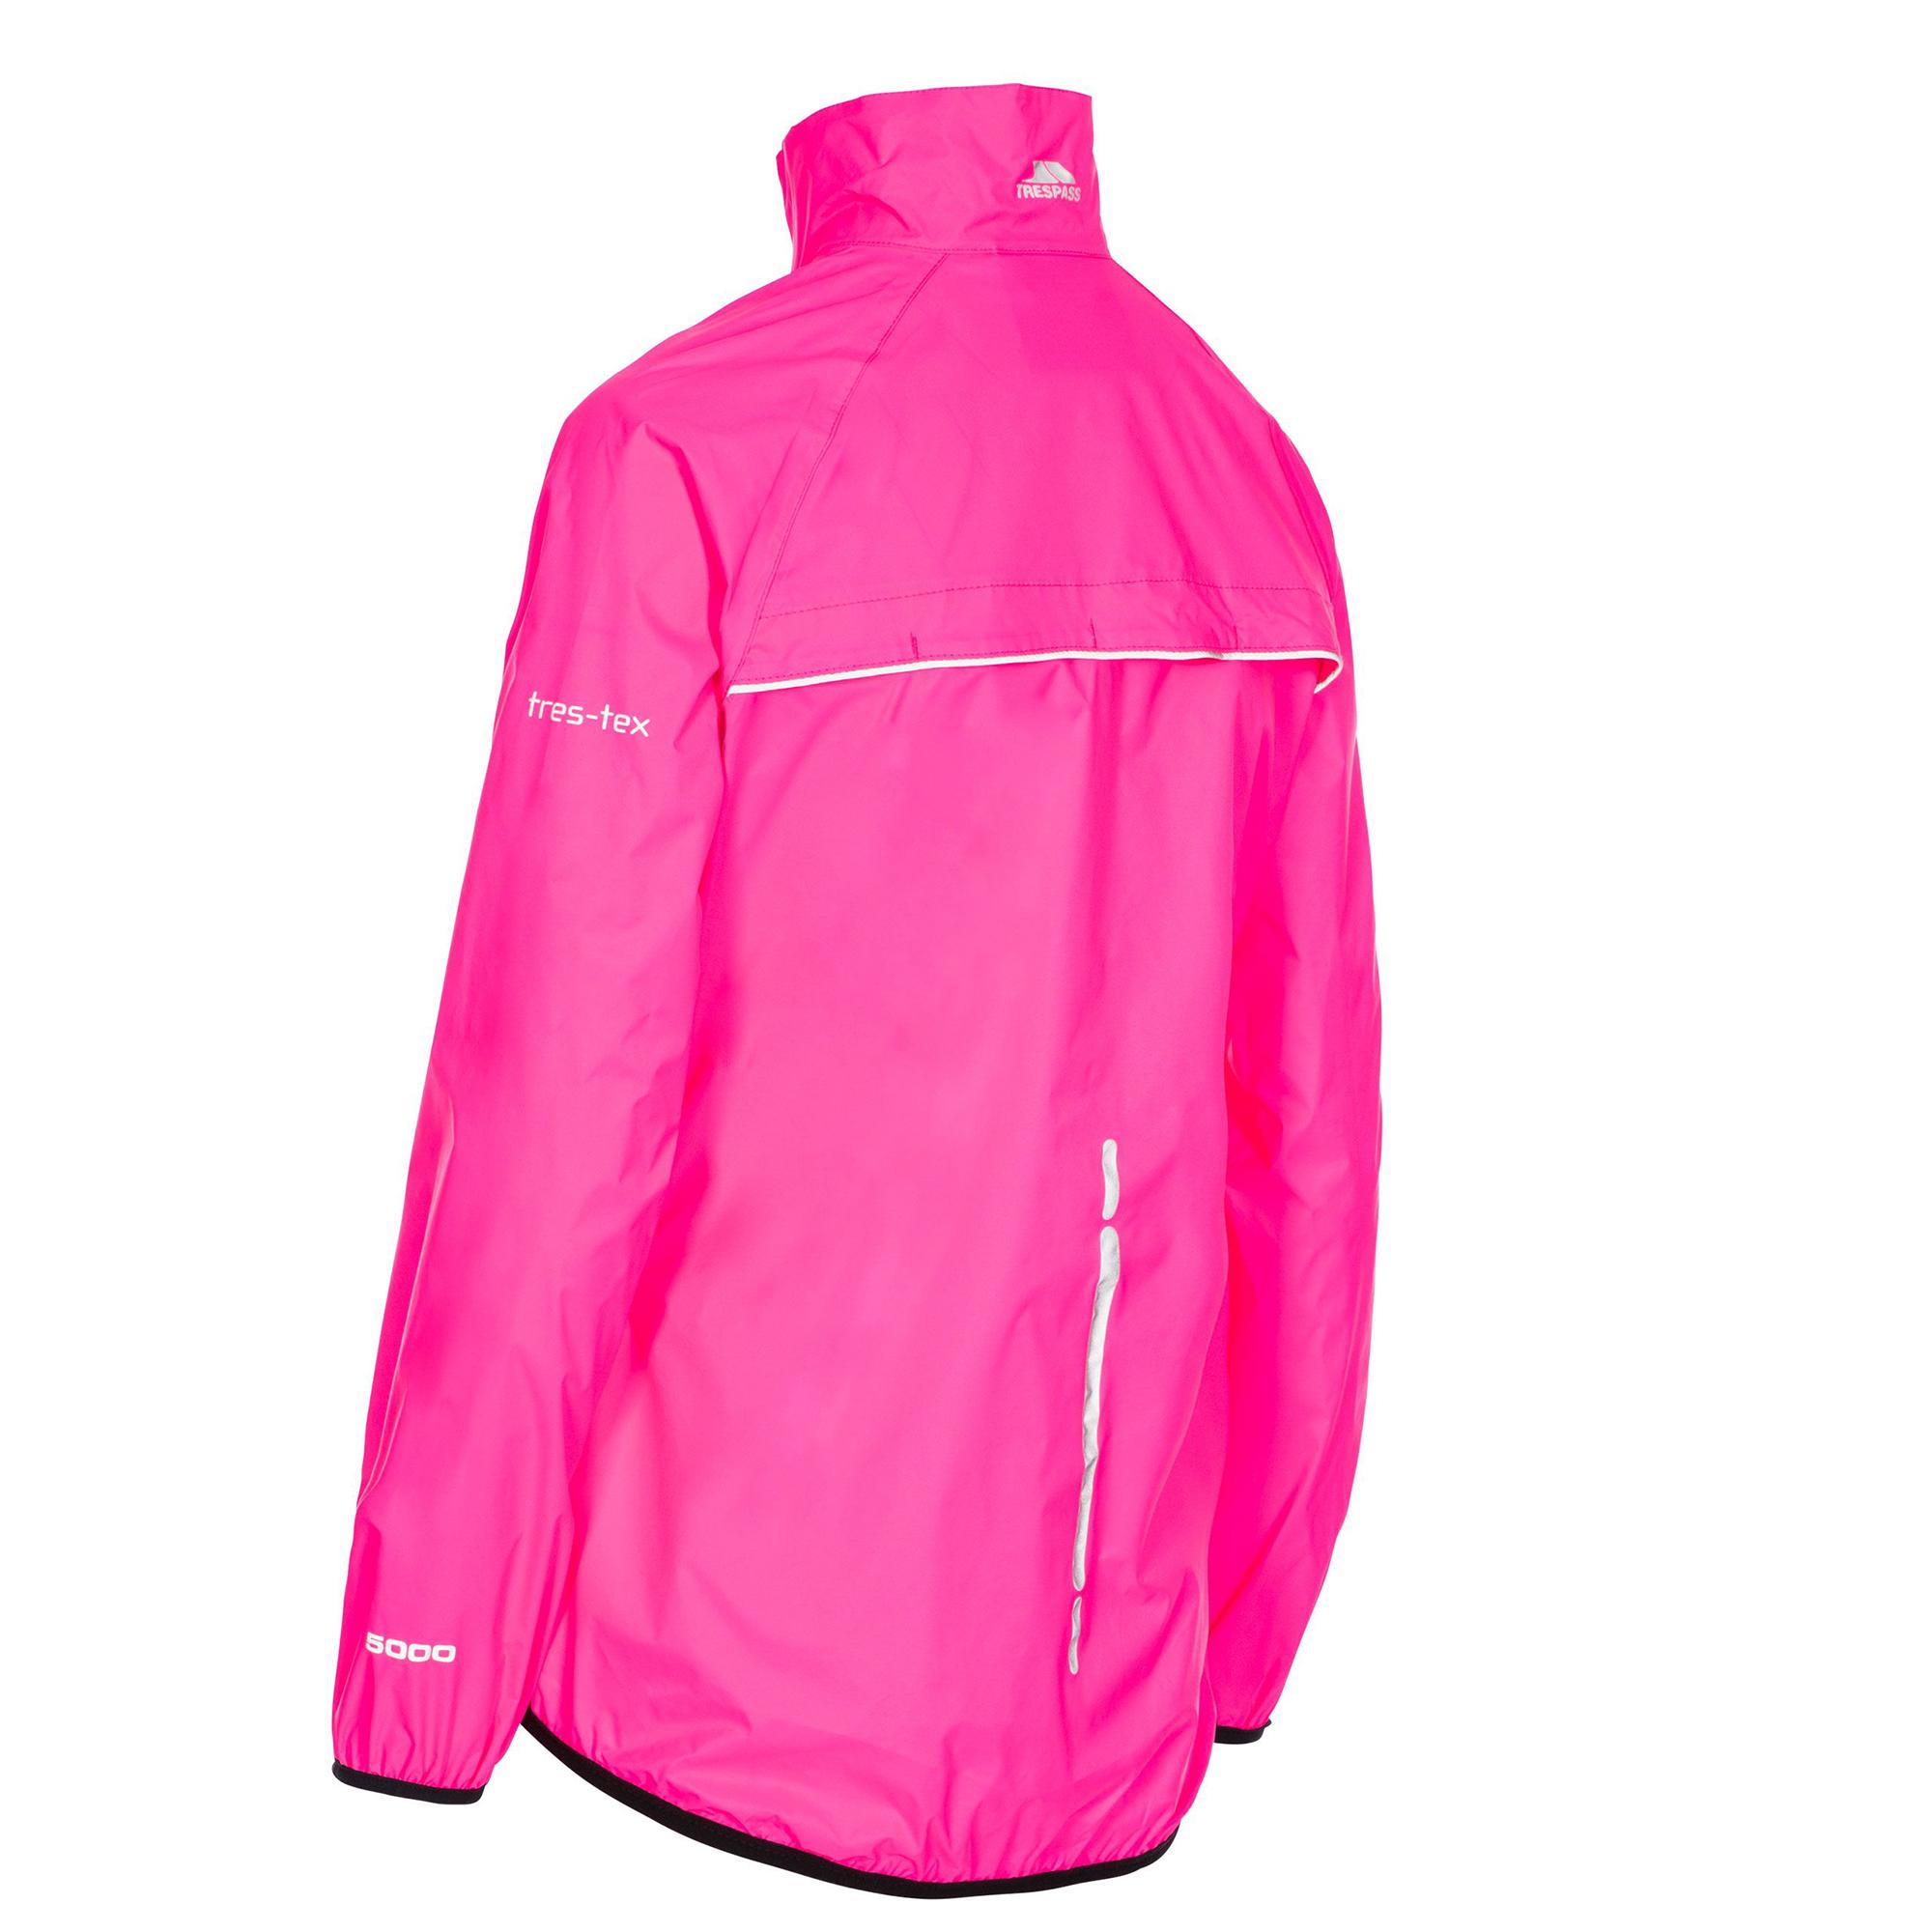 Trespass-Womens-Ladies-Beaming-Packaway-Hi-Vis-Jacket-TP4616 thumbnail 6